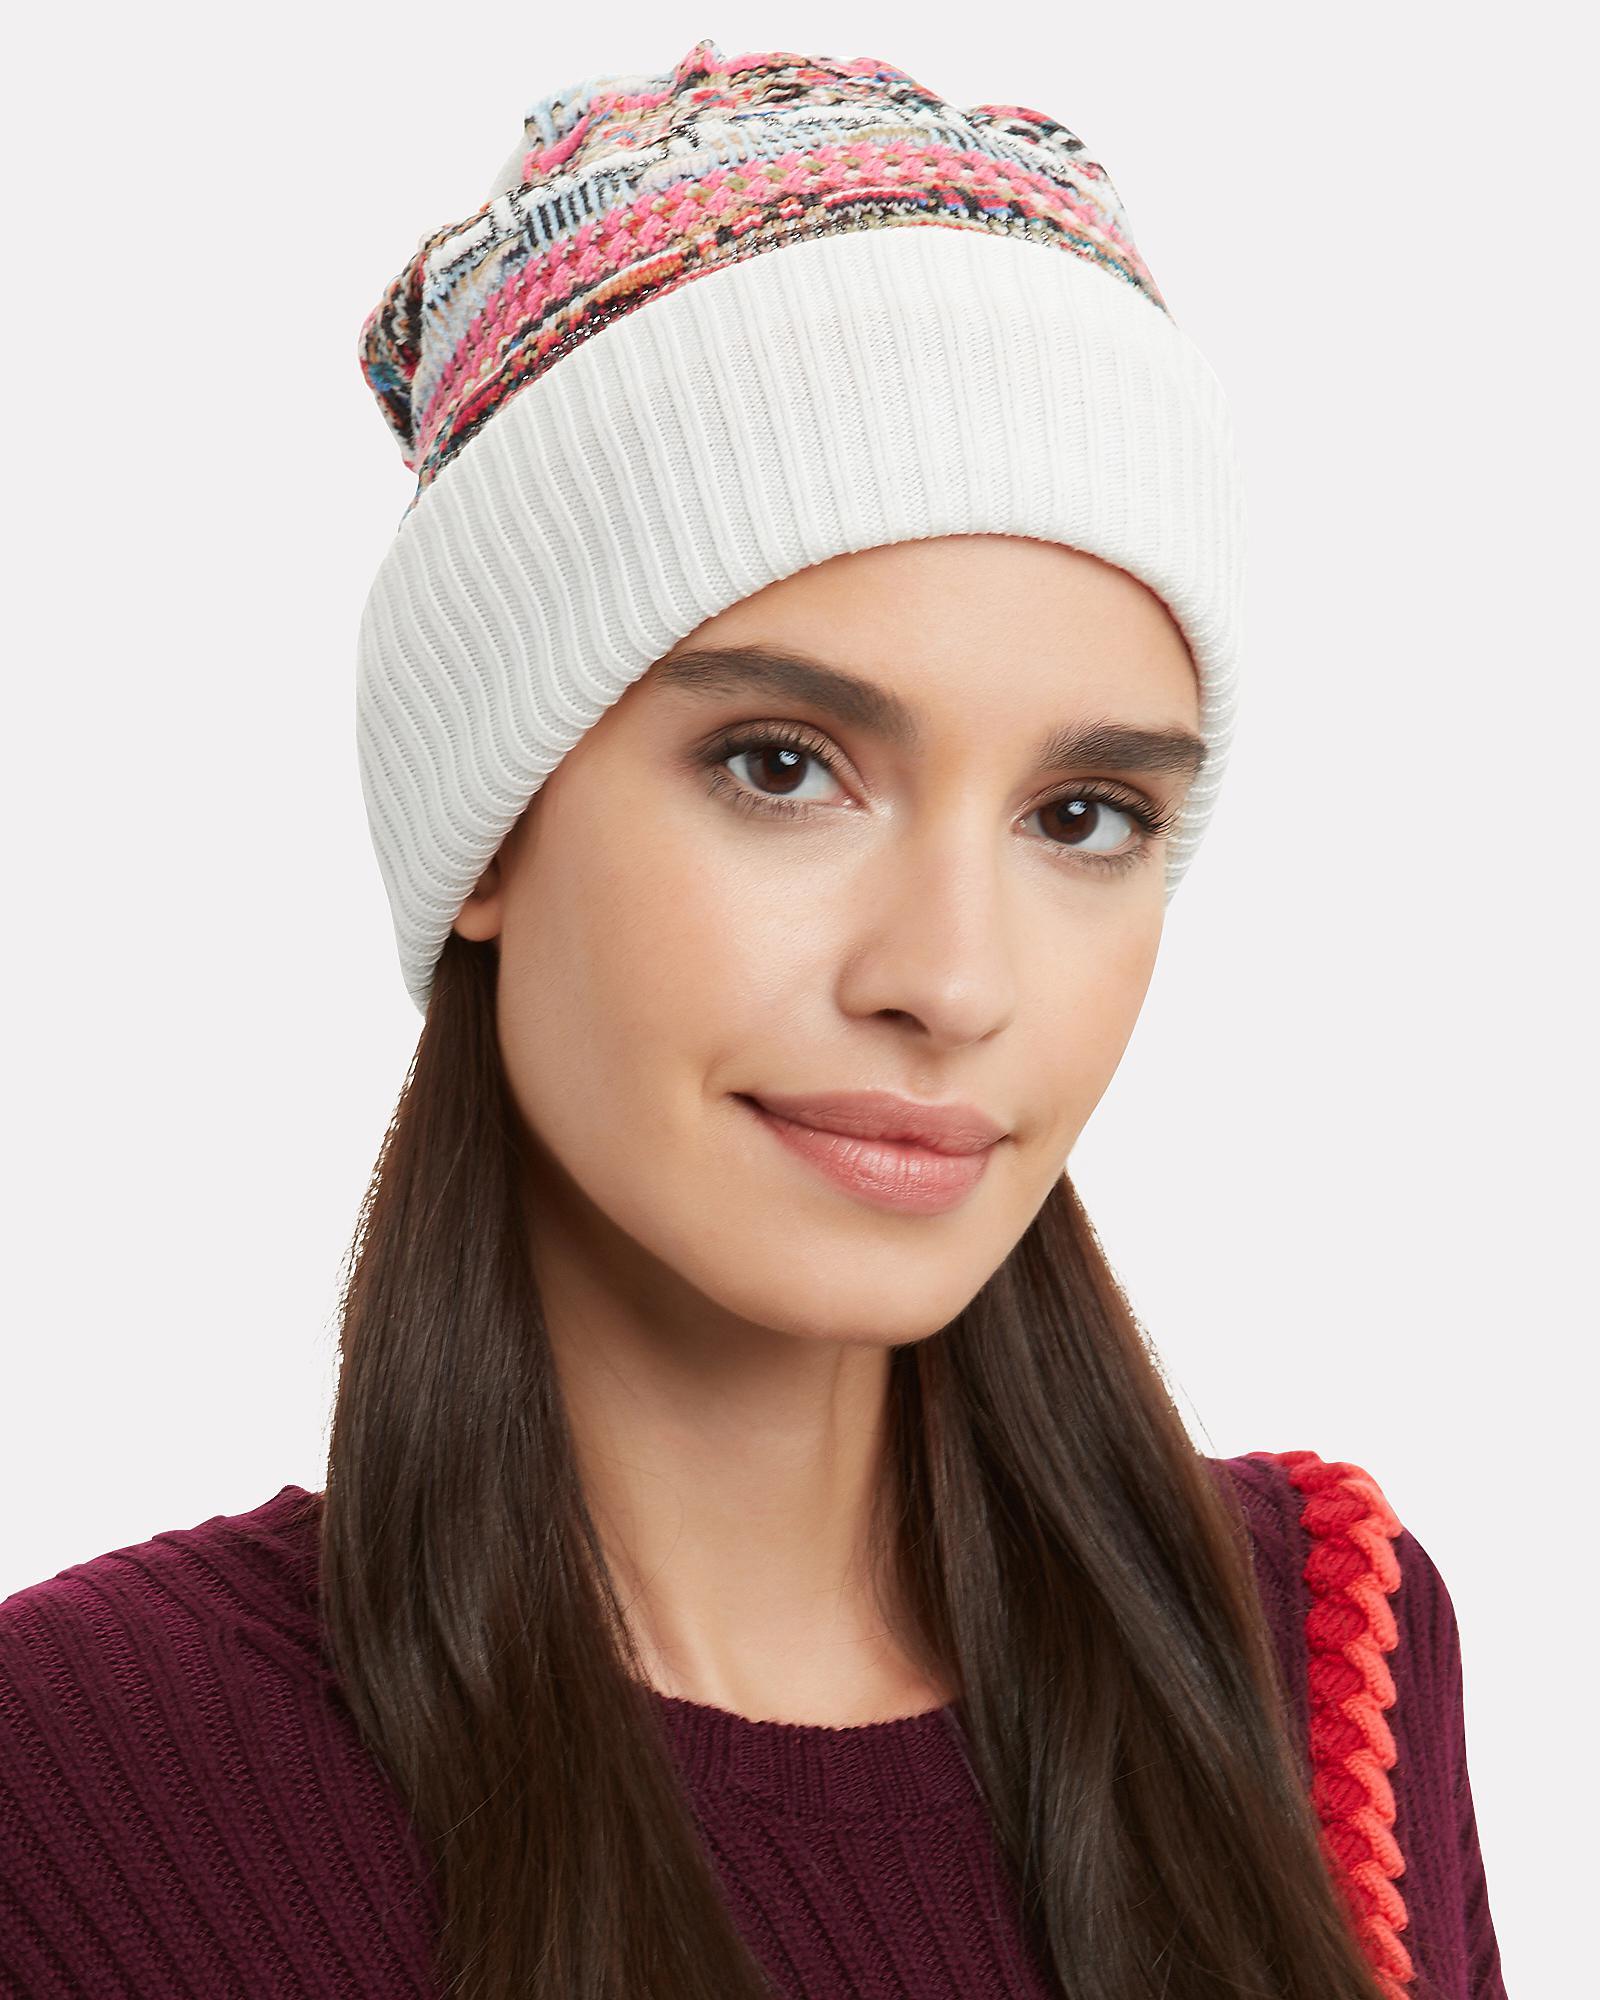 f50a101a289 Missoni - Multicolored Knit Hat - Lyst. View fullscreen